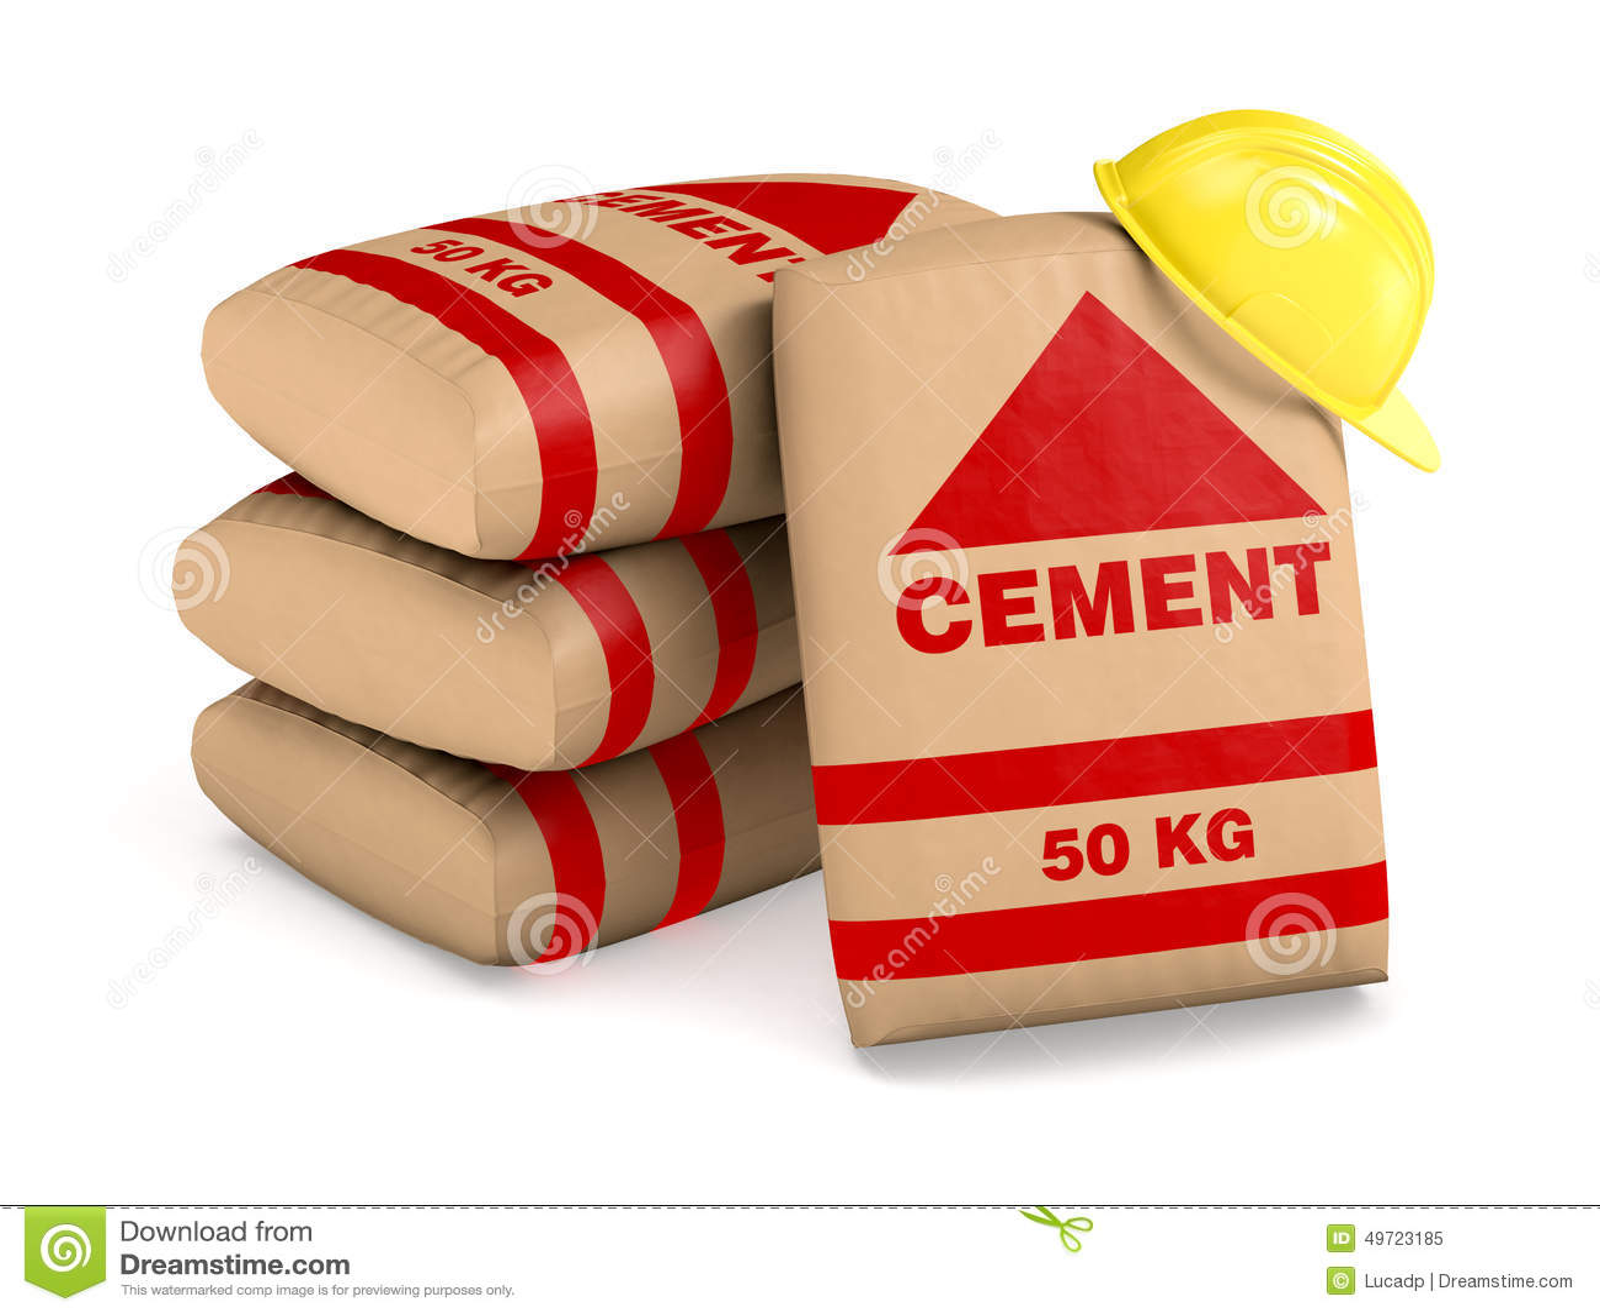 sacs de ciment illustration stock illustration du closeup 49723185. Black Bedroom Furniture Sets. Home Design Ideas